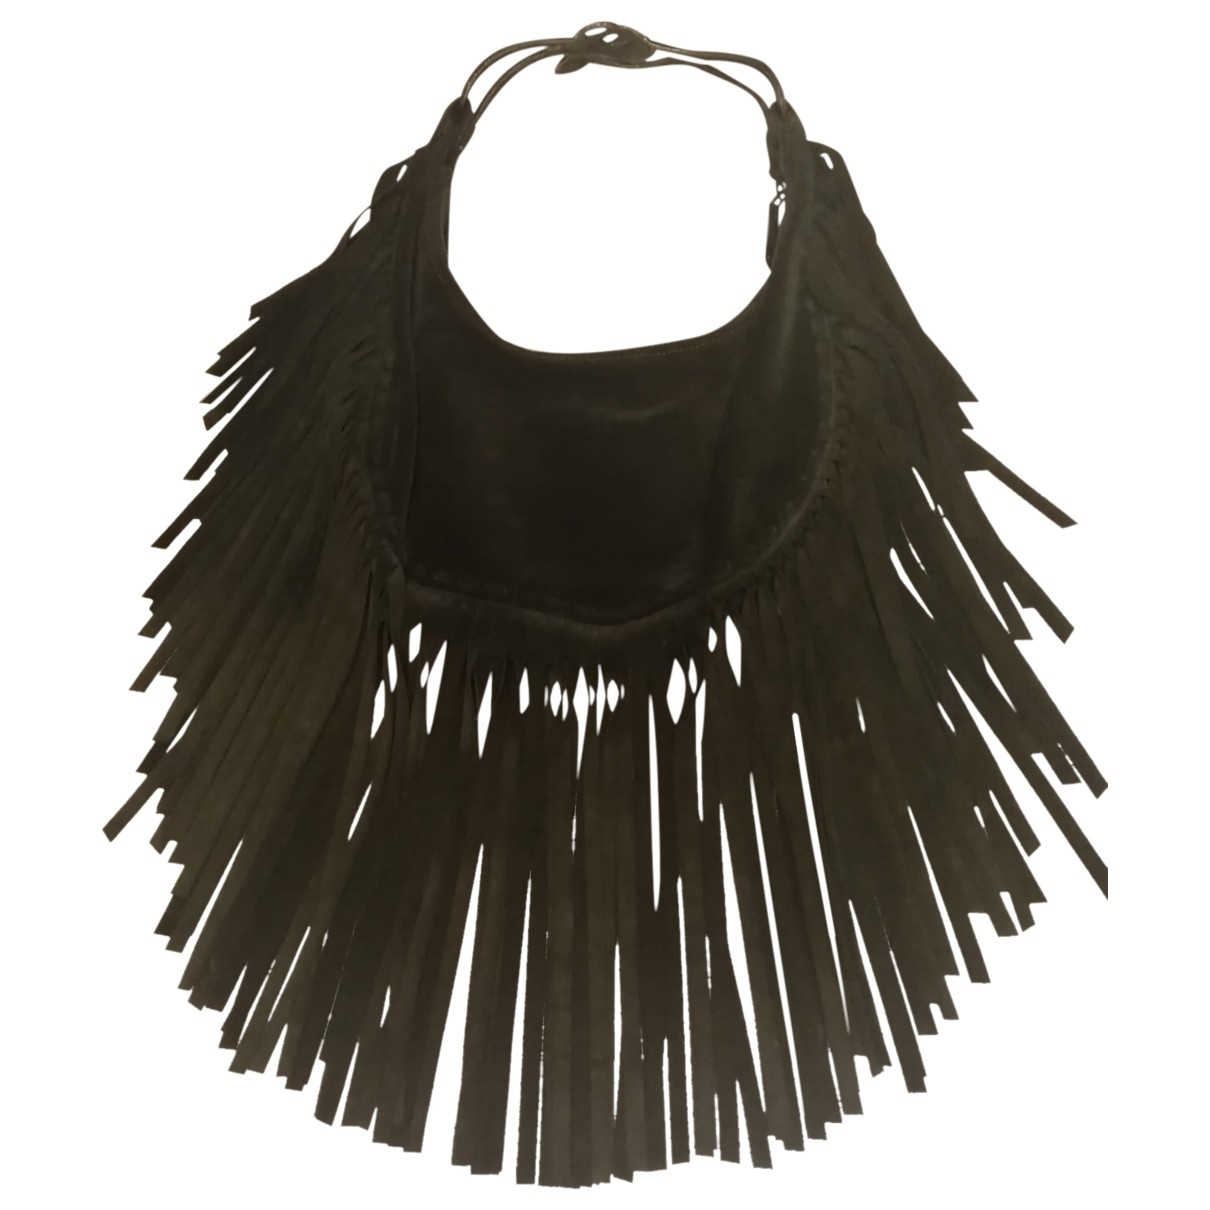 Valentino Garavani \N Green Suede handbag for Women \N